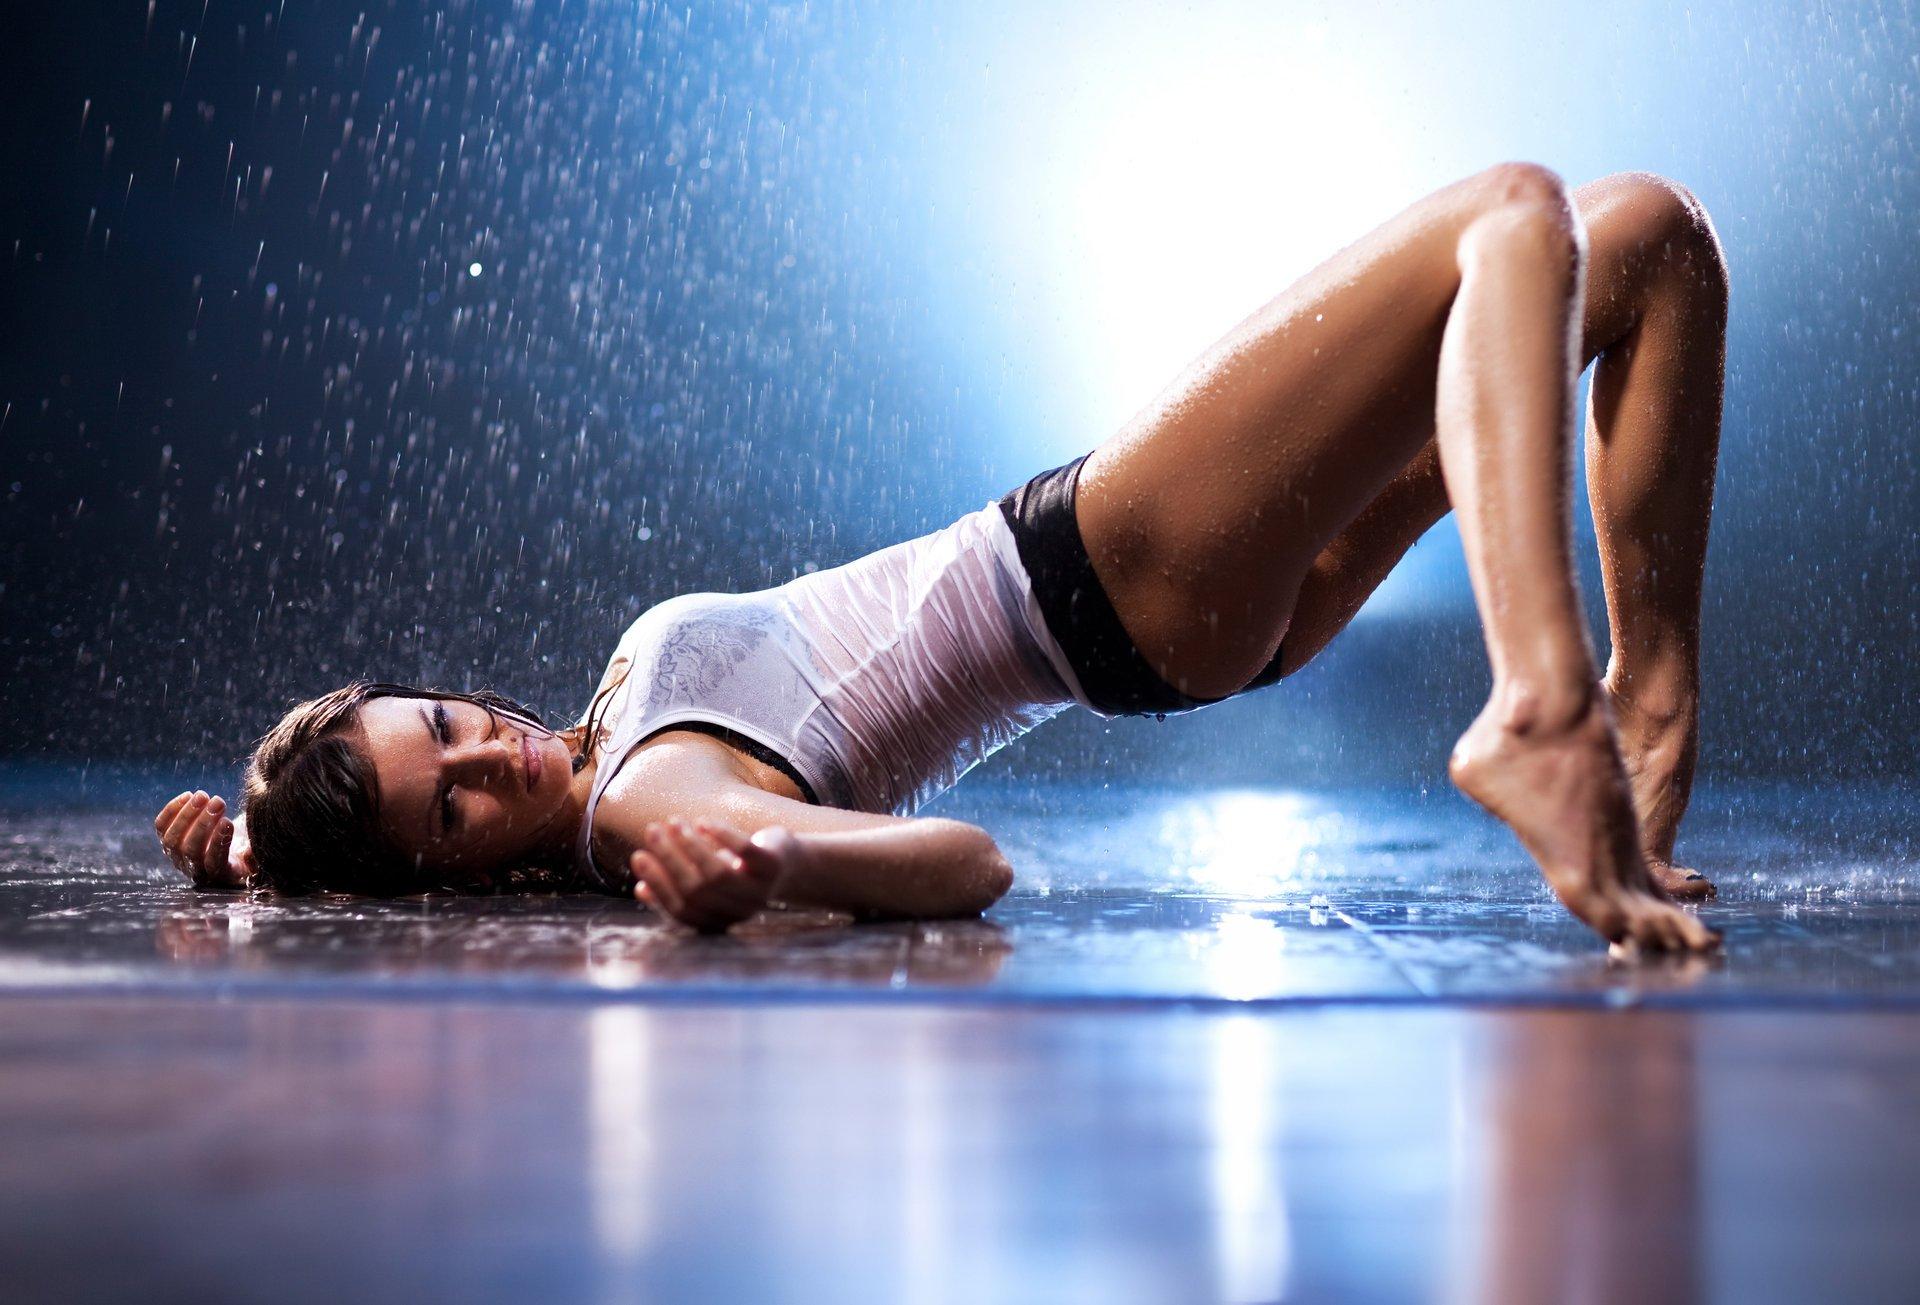 Супер мокрый оргазм видео Так